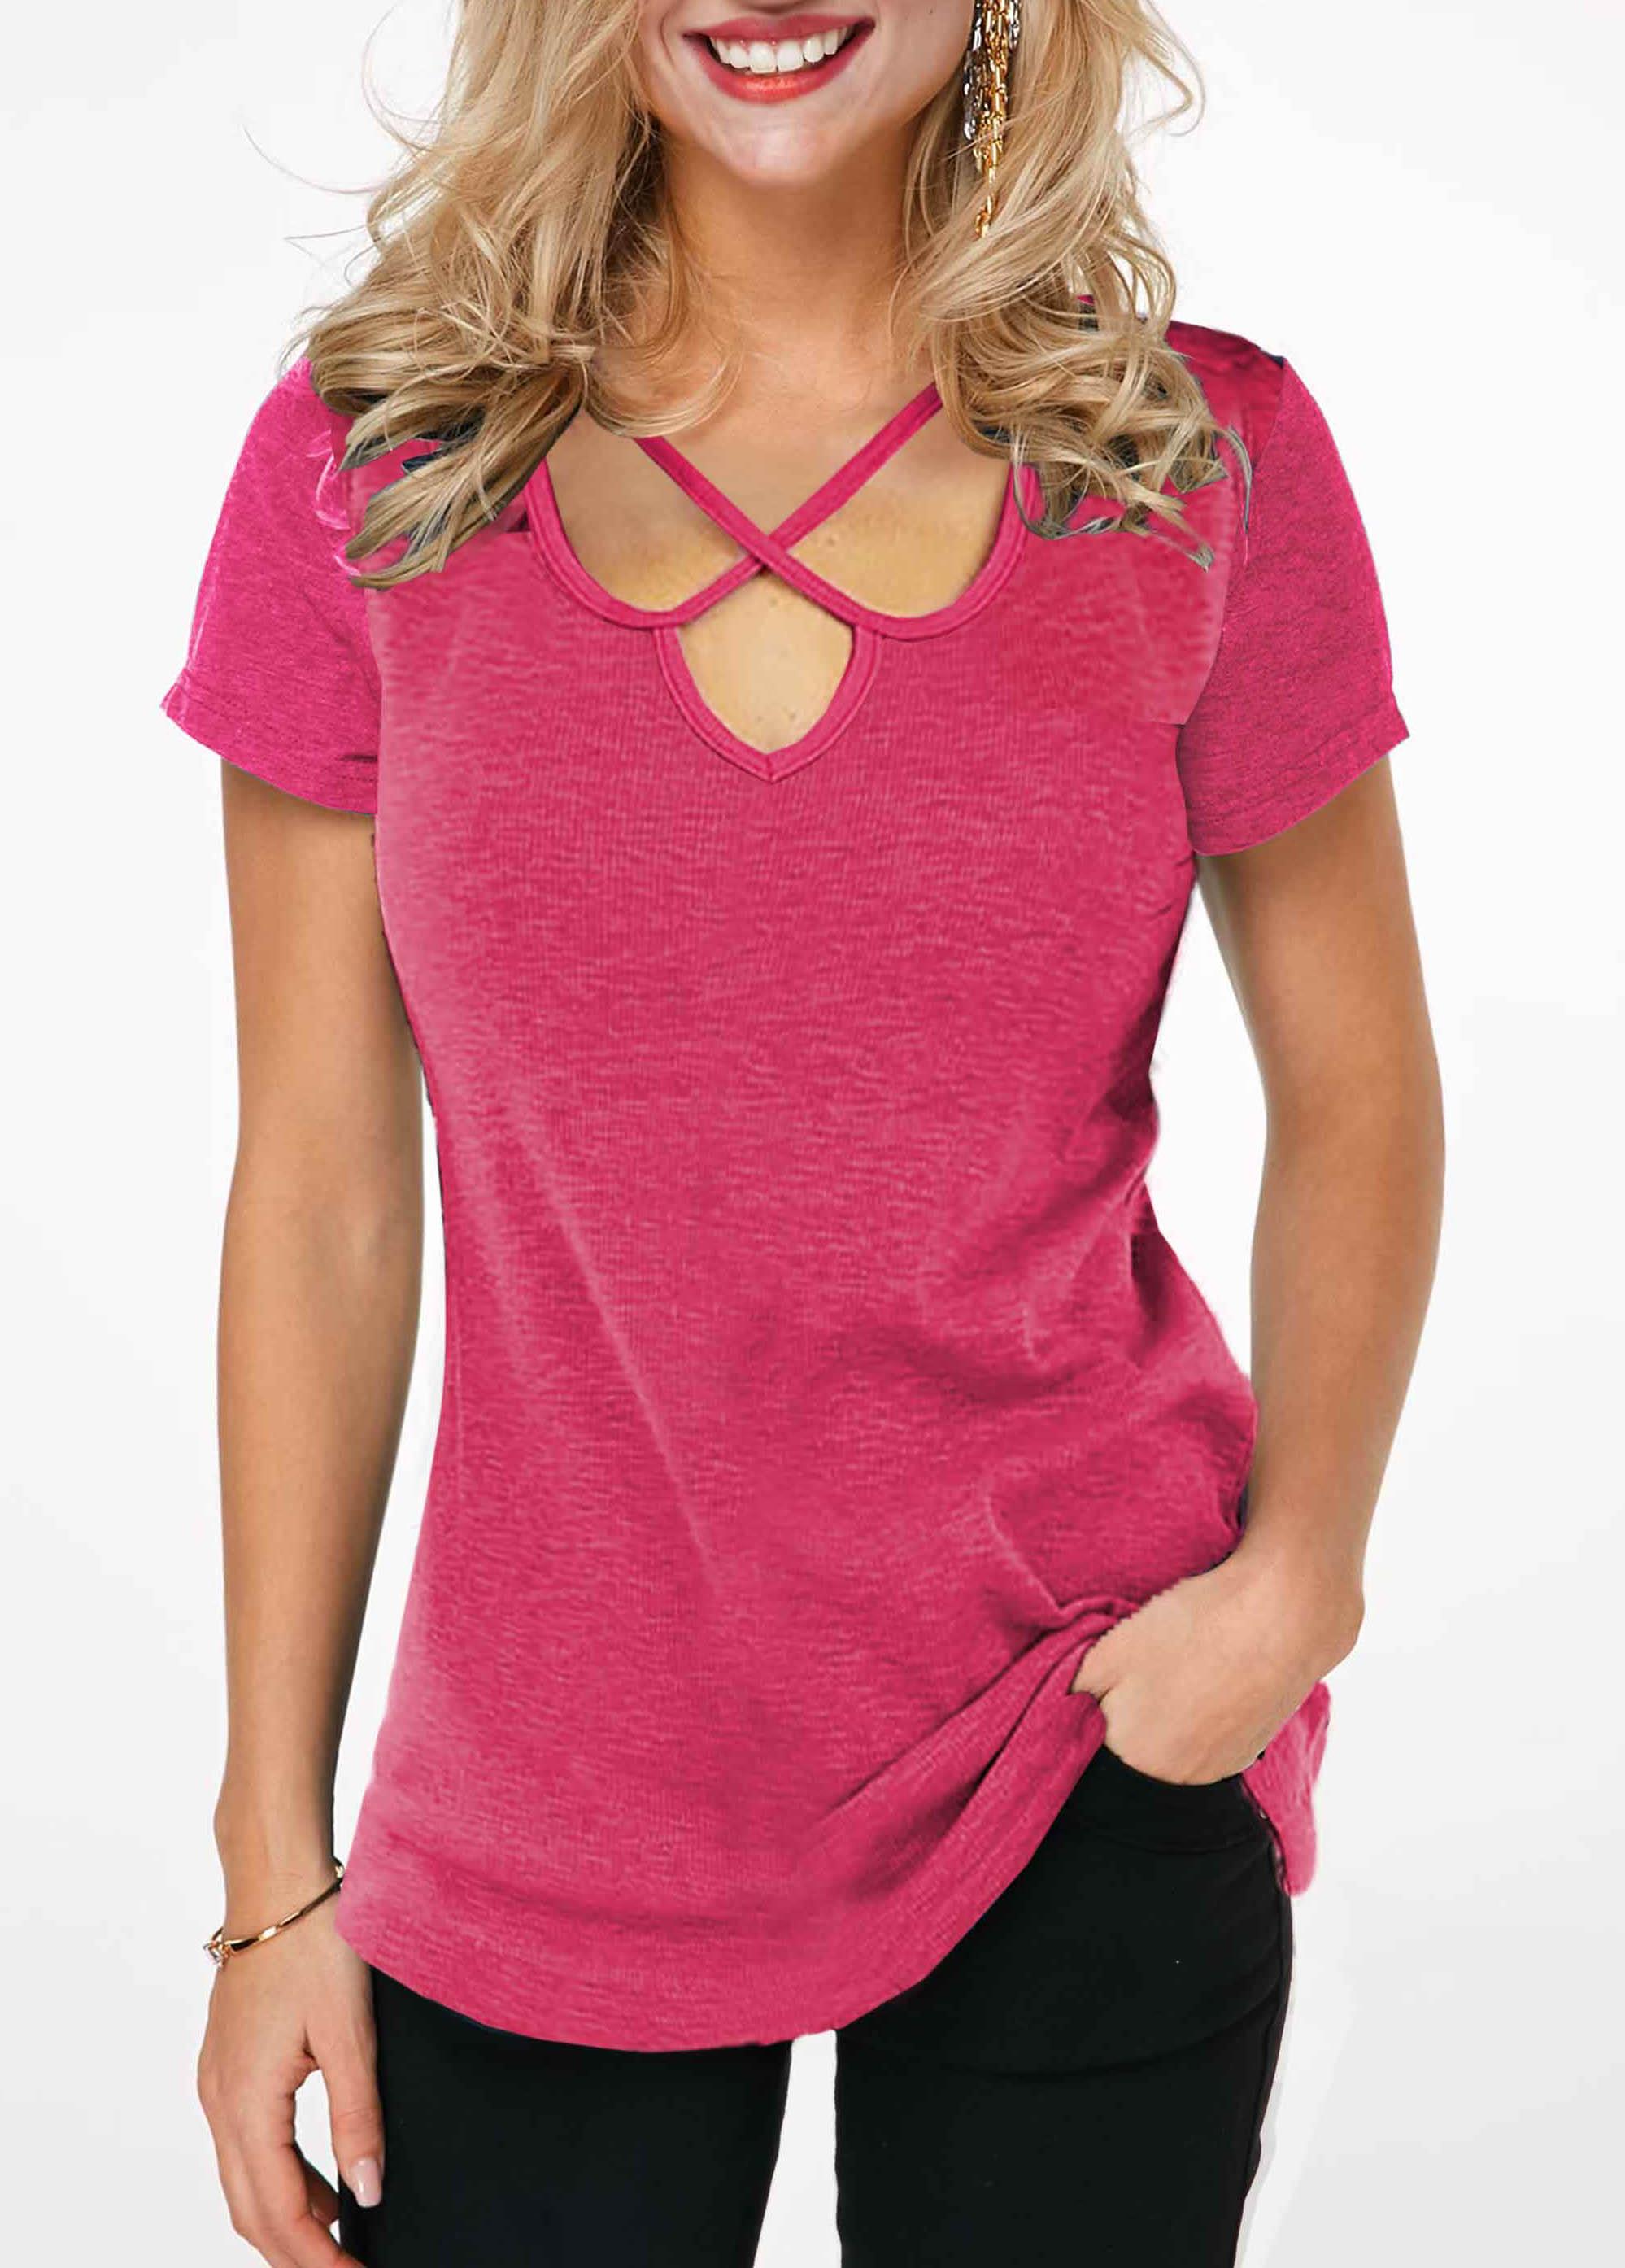 ROTITA Short Sleeve Cross Strap Solid T Shirt